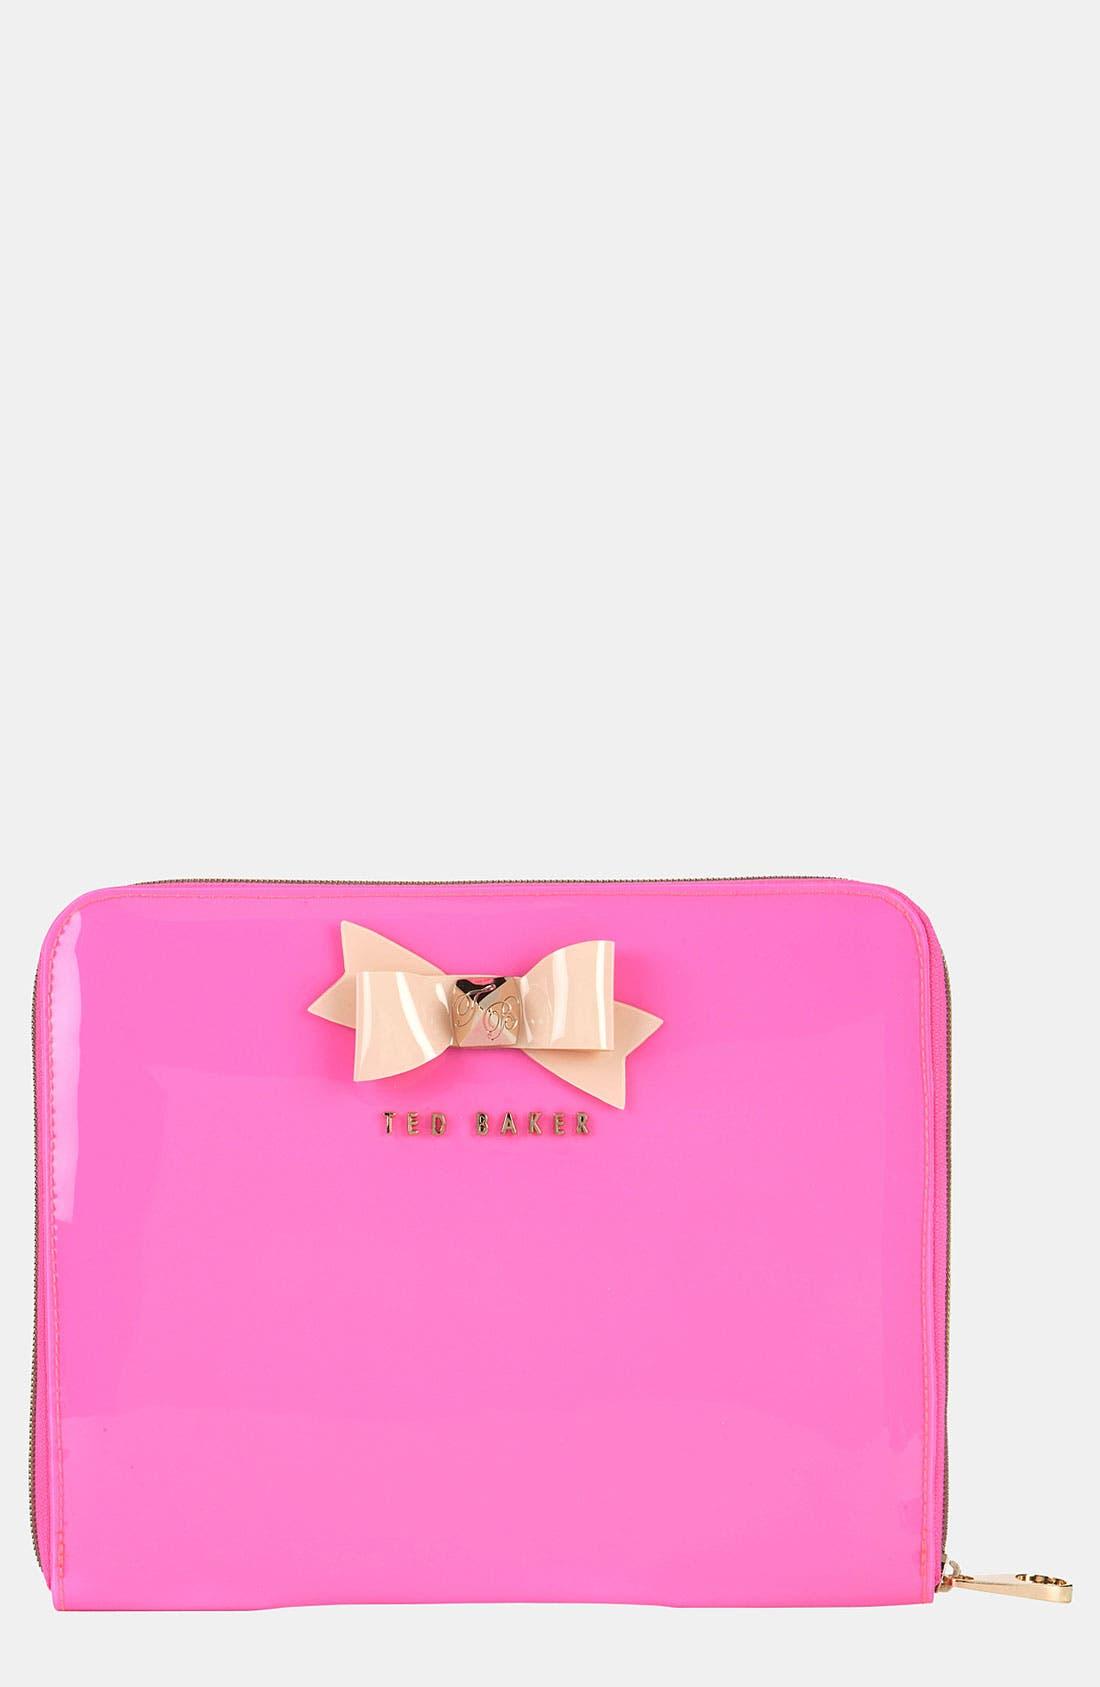 Main Image - Ted Baker London 'Bow' iPad Case